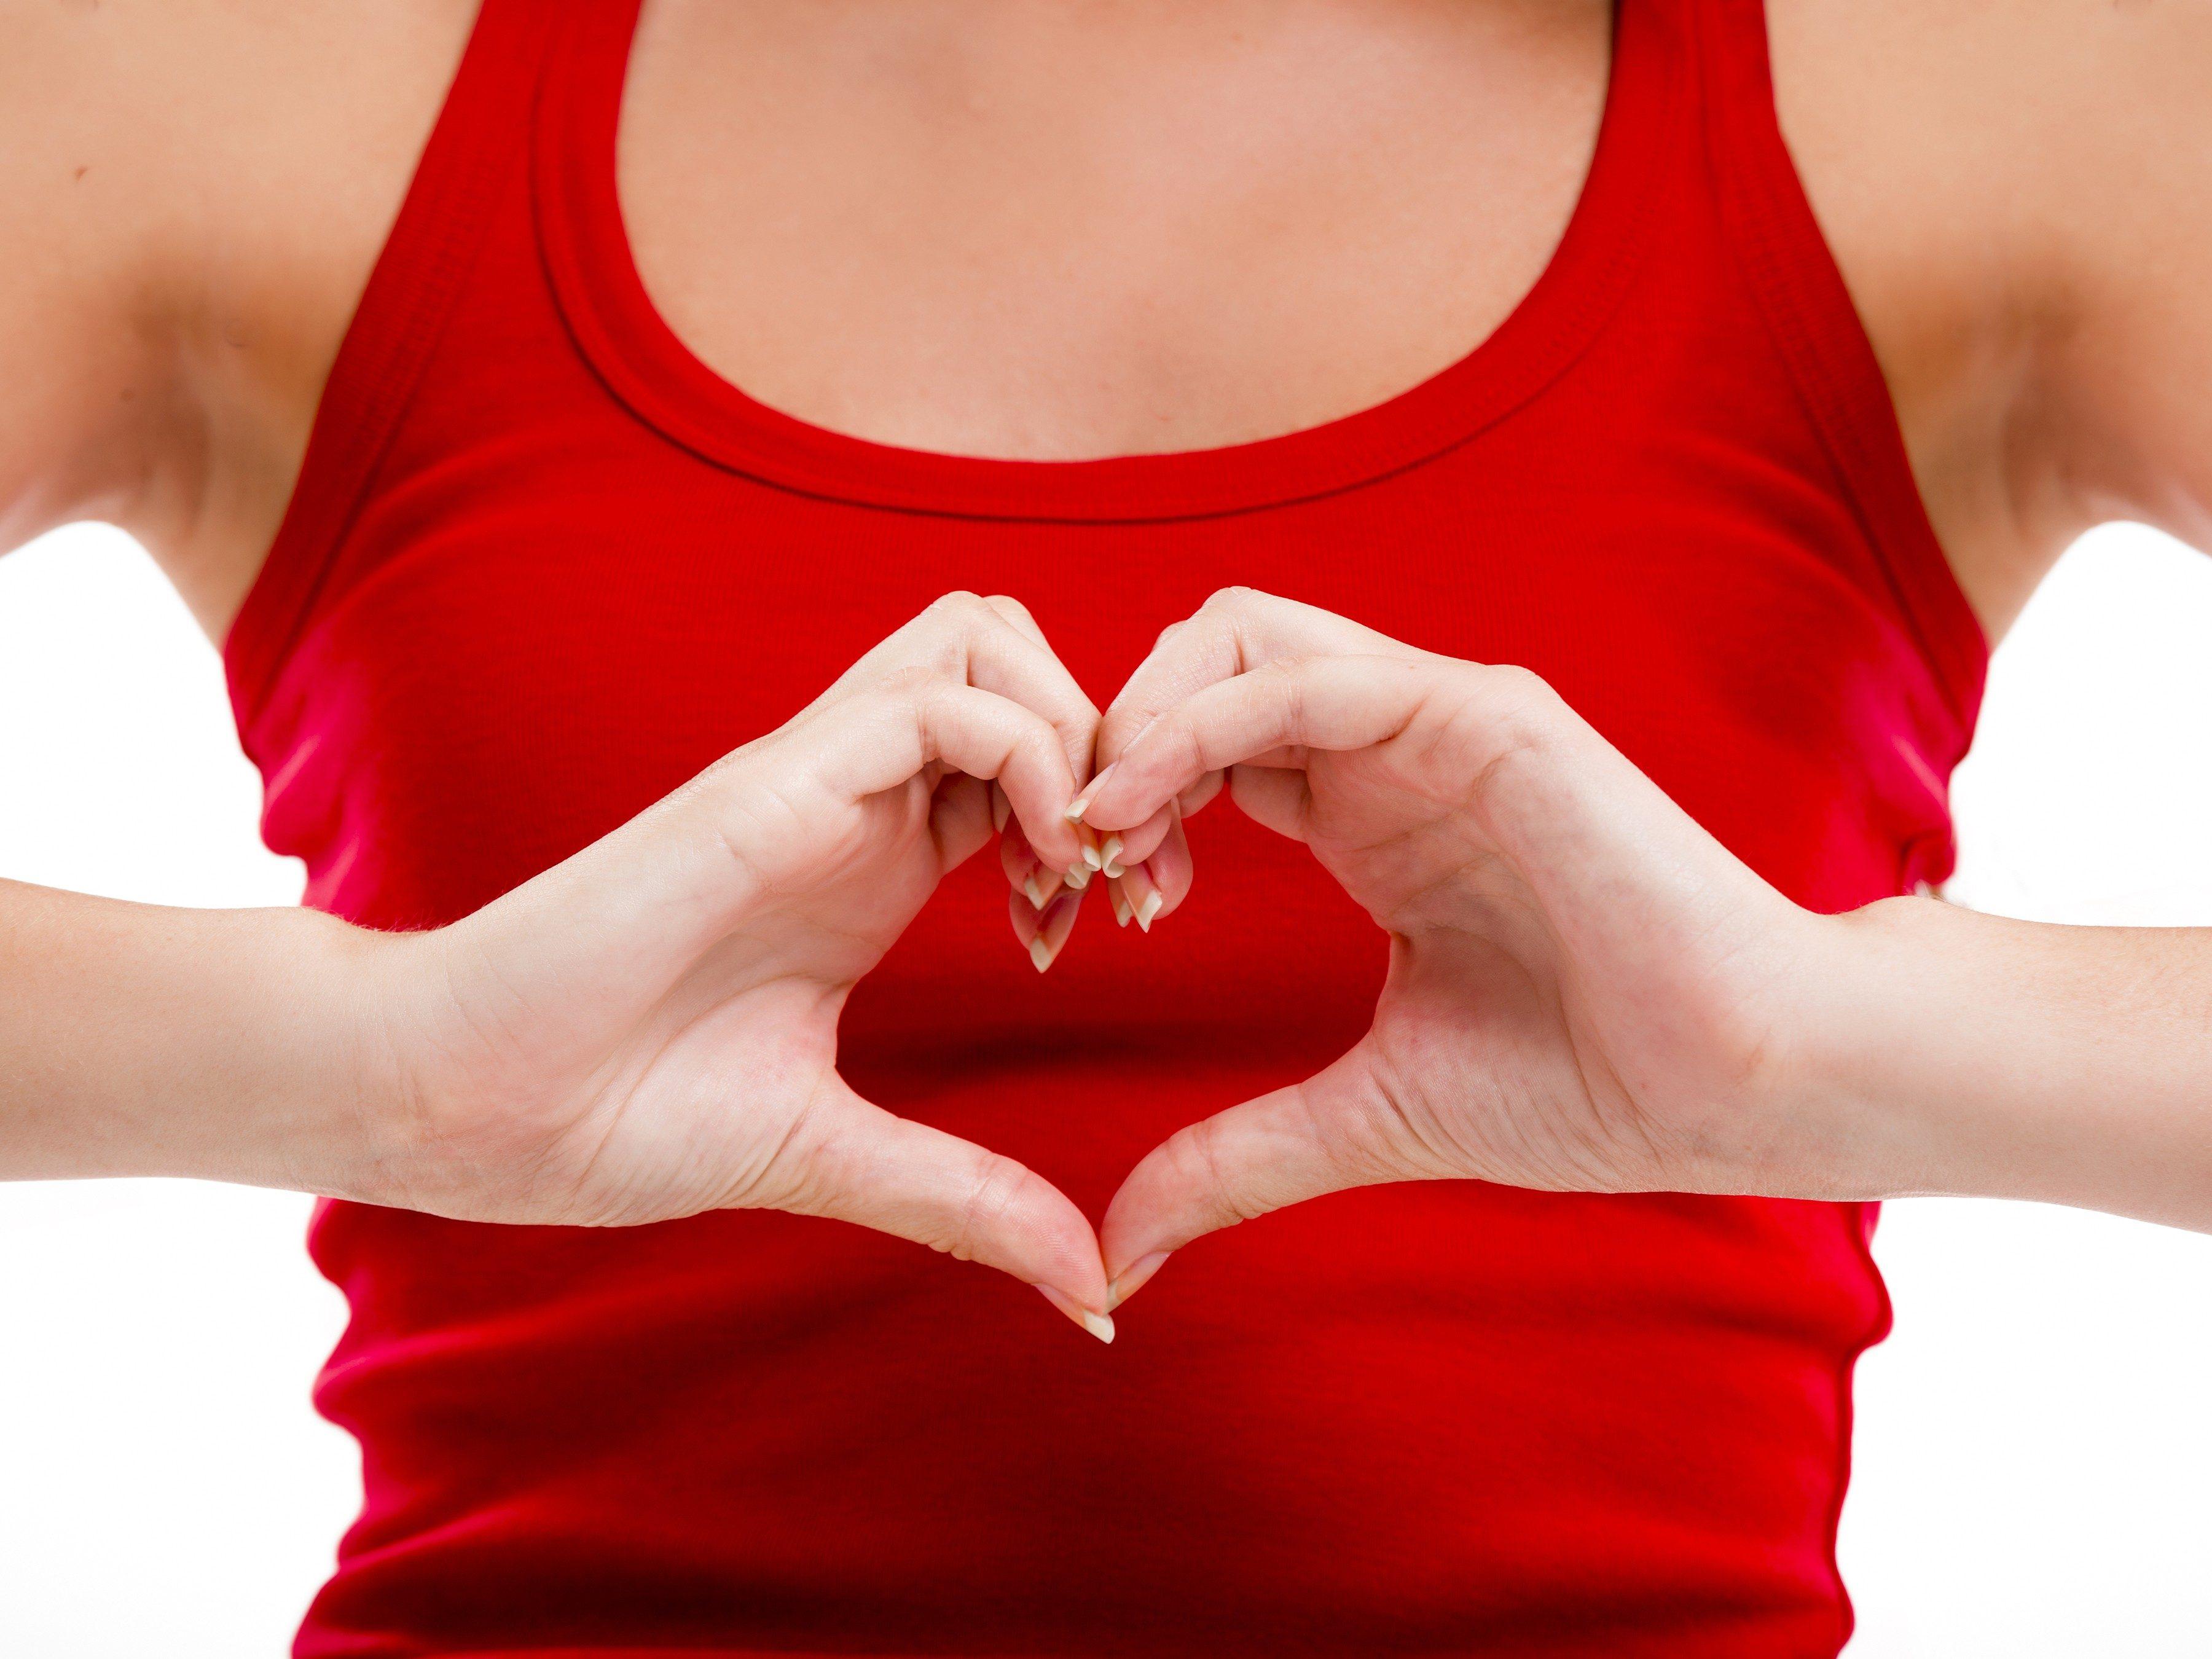 How to Get Heart-Smart